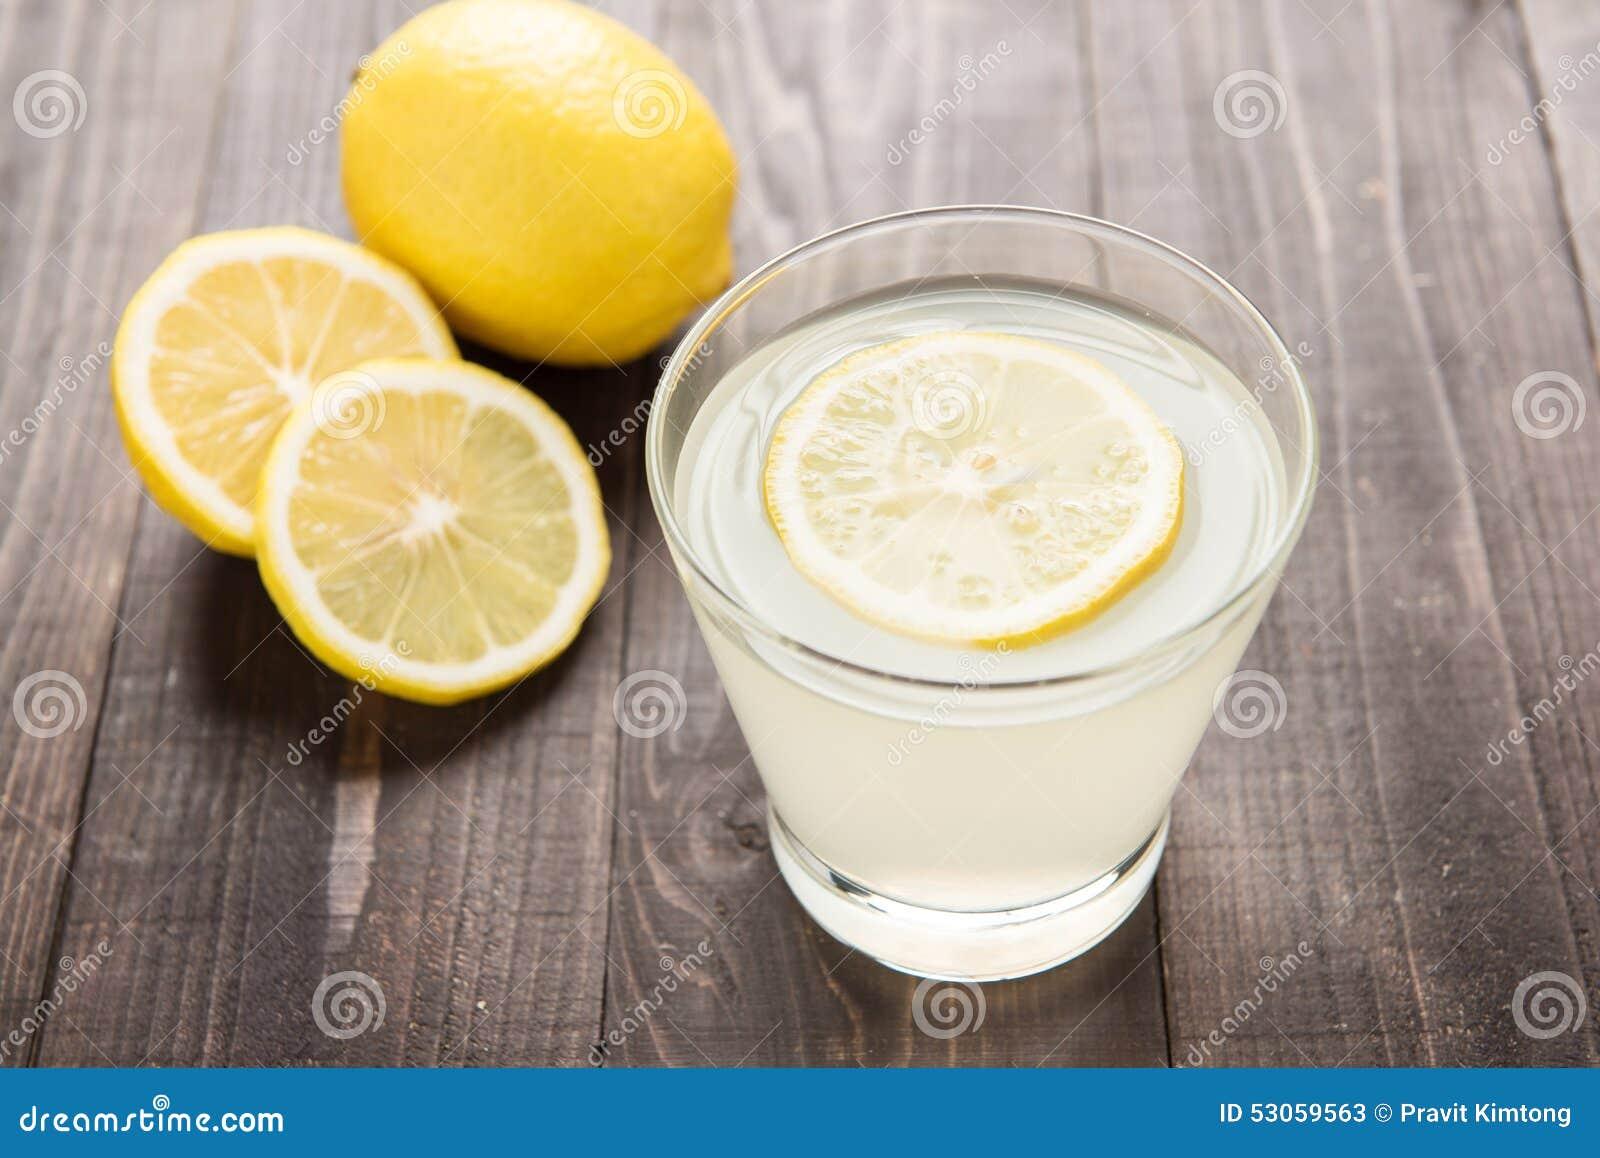 Vers gedrukt citroensap in glas